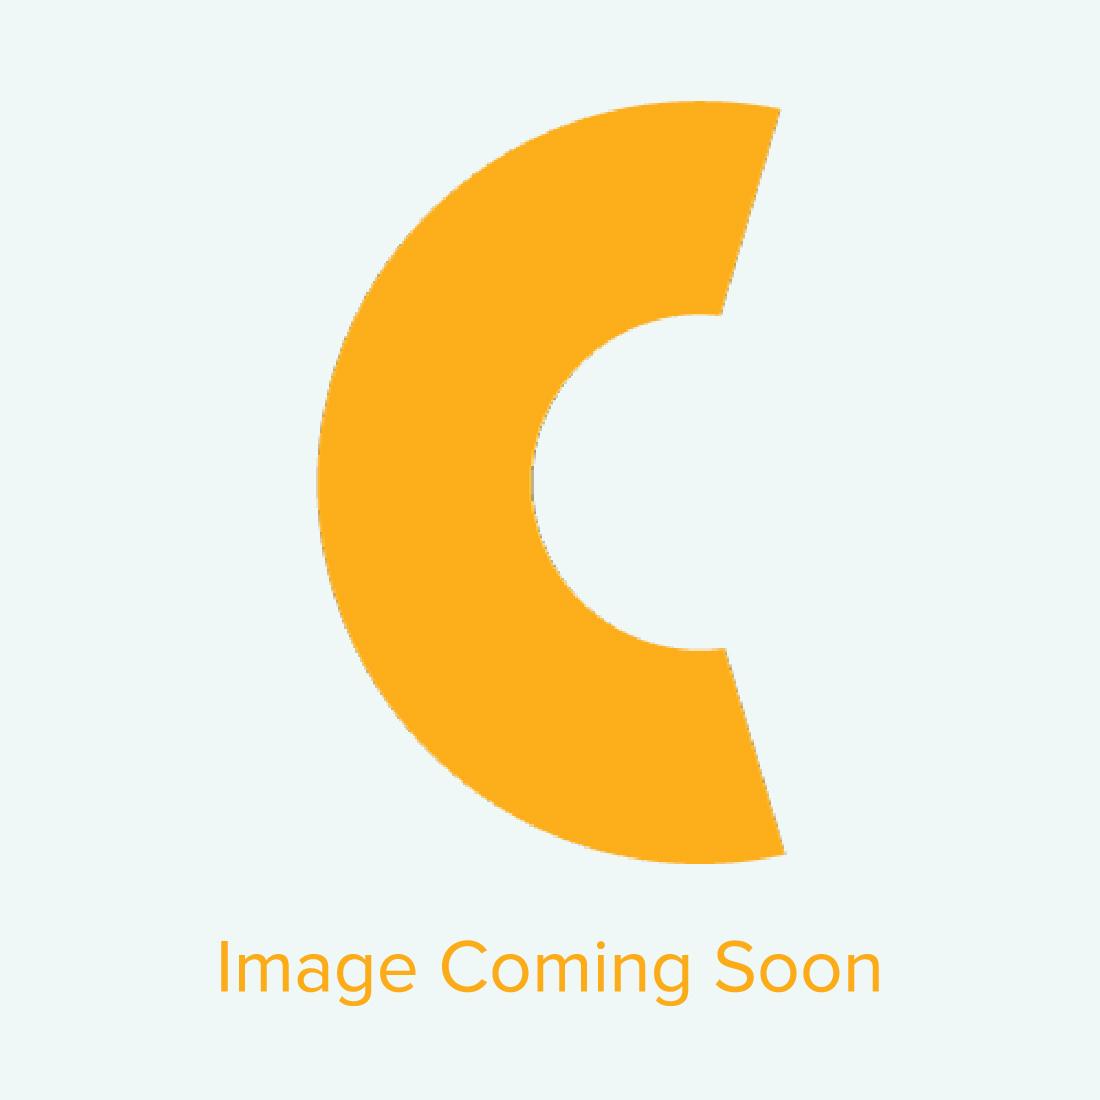 "TriSolv PhotoArt Paper - 210 gsm – 54"" x 150' - OVERSTOCK"